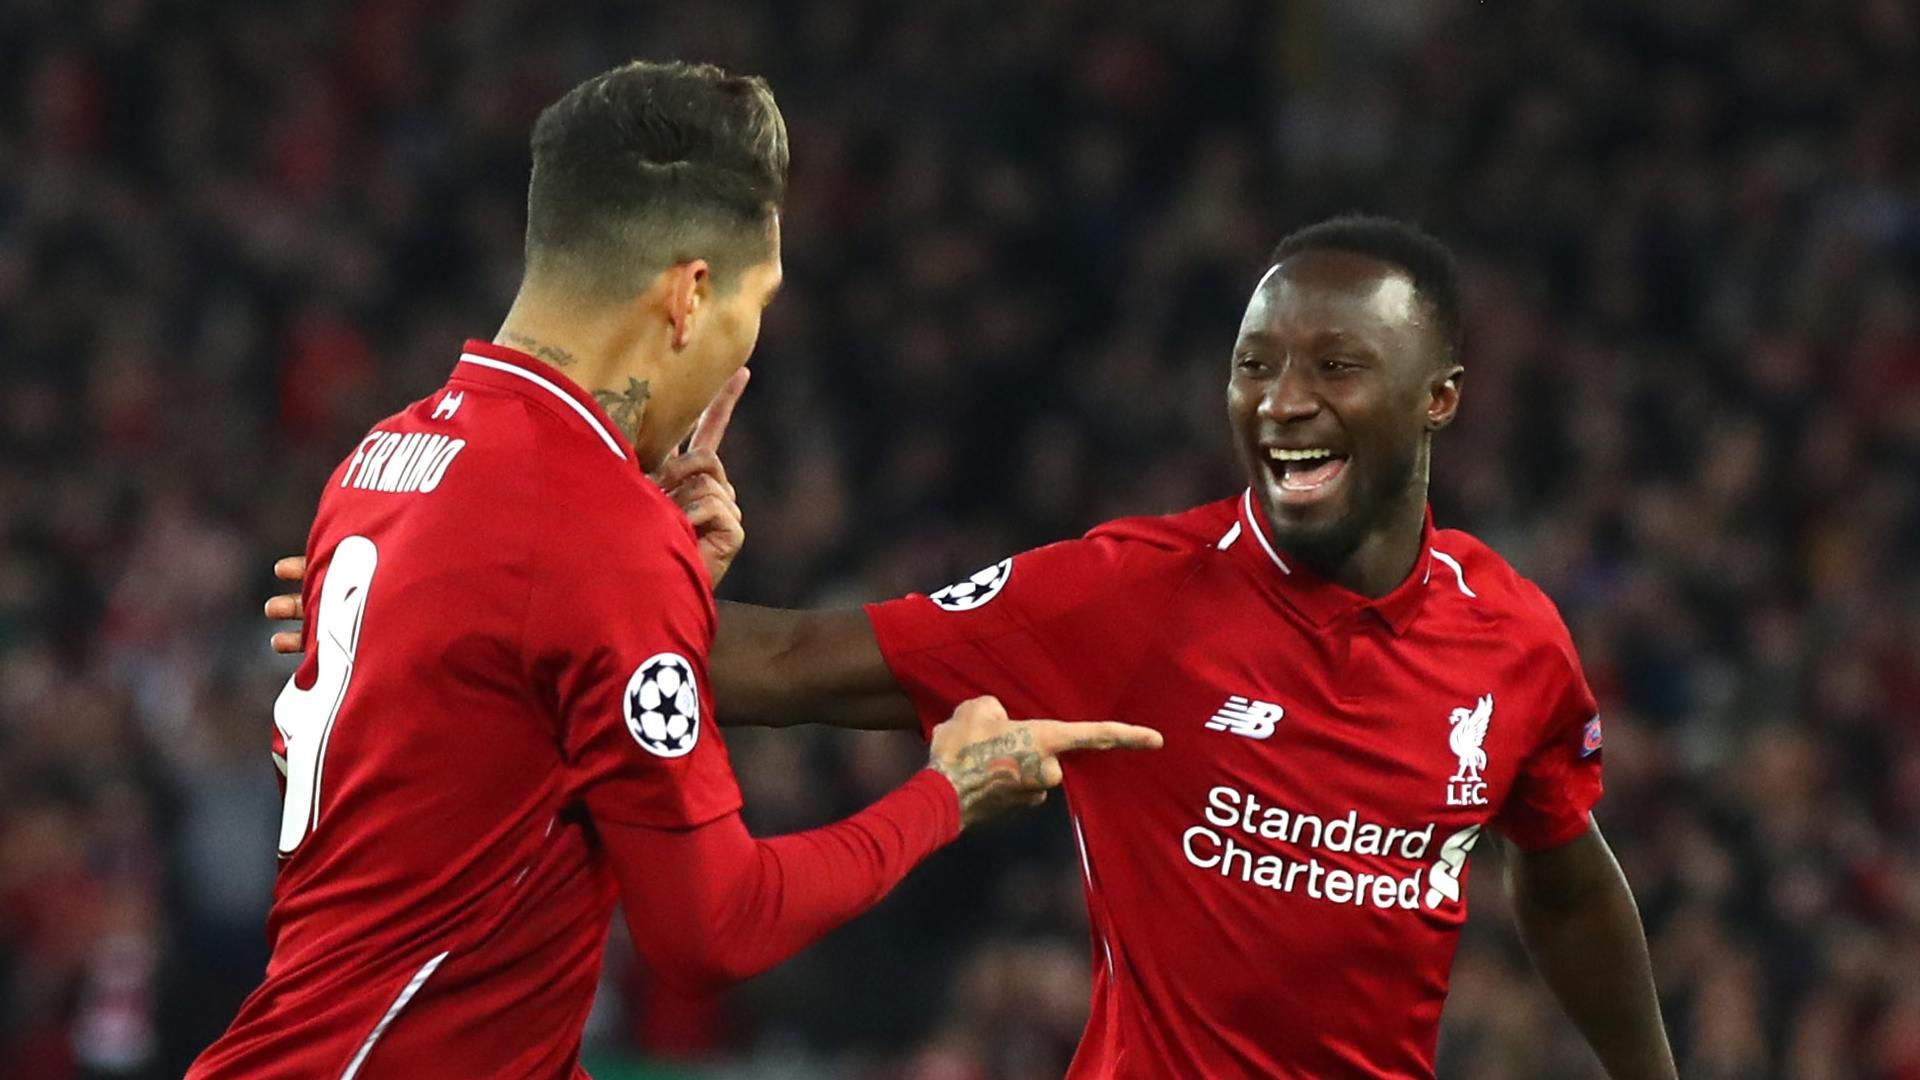 Ligue des Champions - Liverpool : Roberto Firmino apte pour la finale, Naby Keita forfait